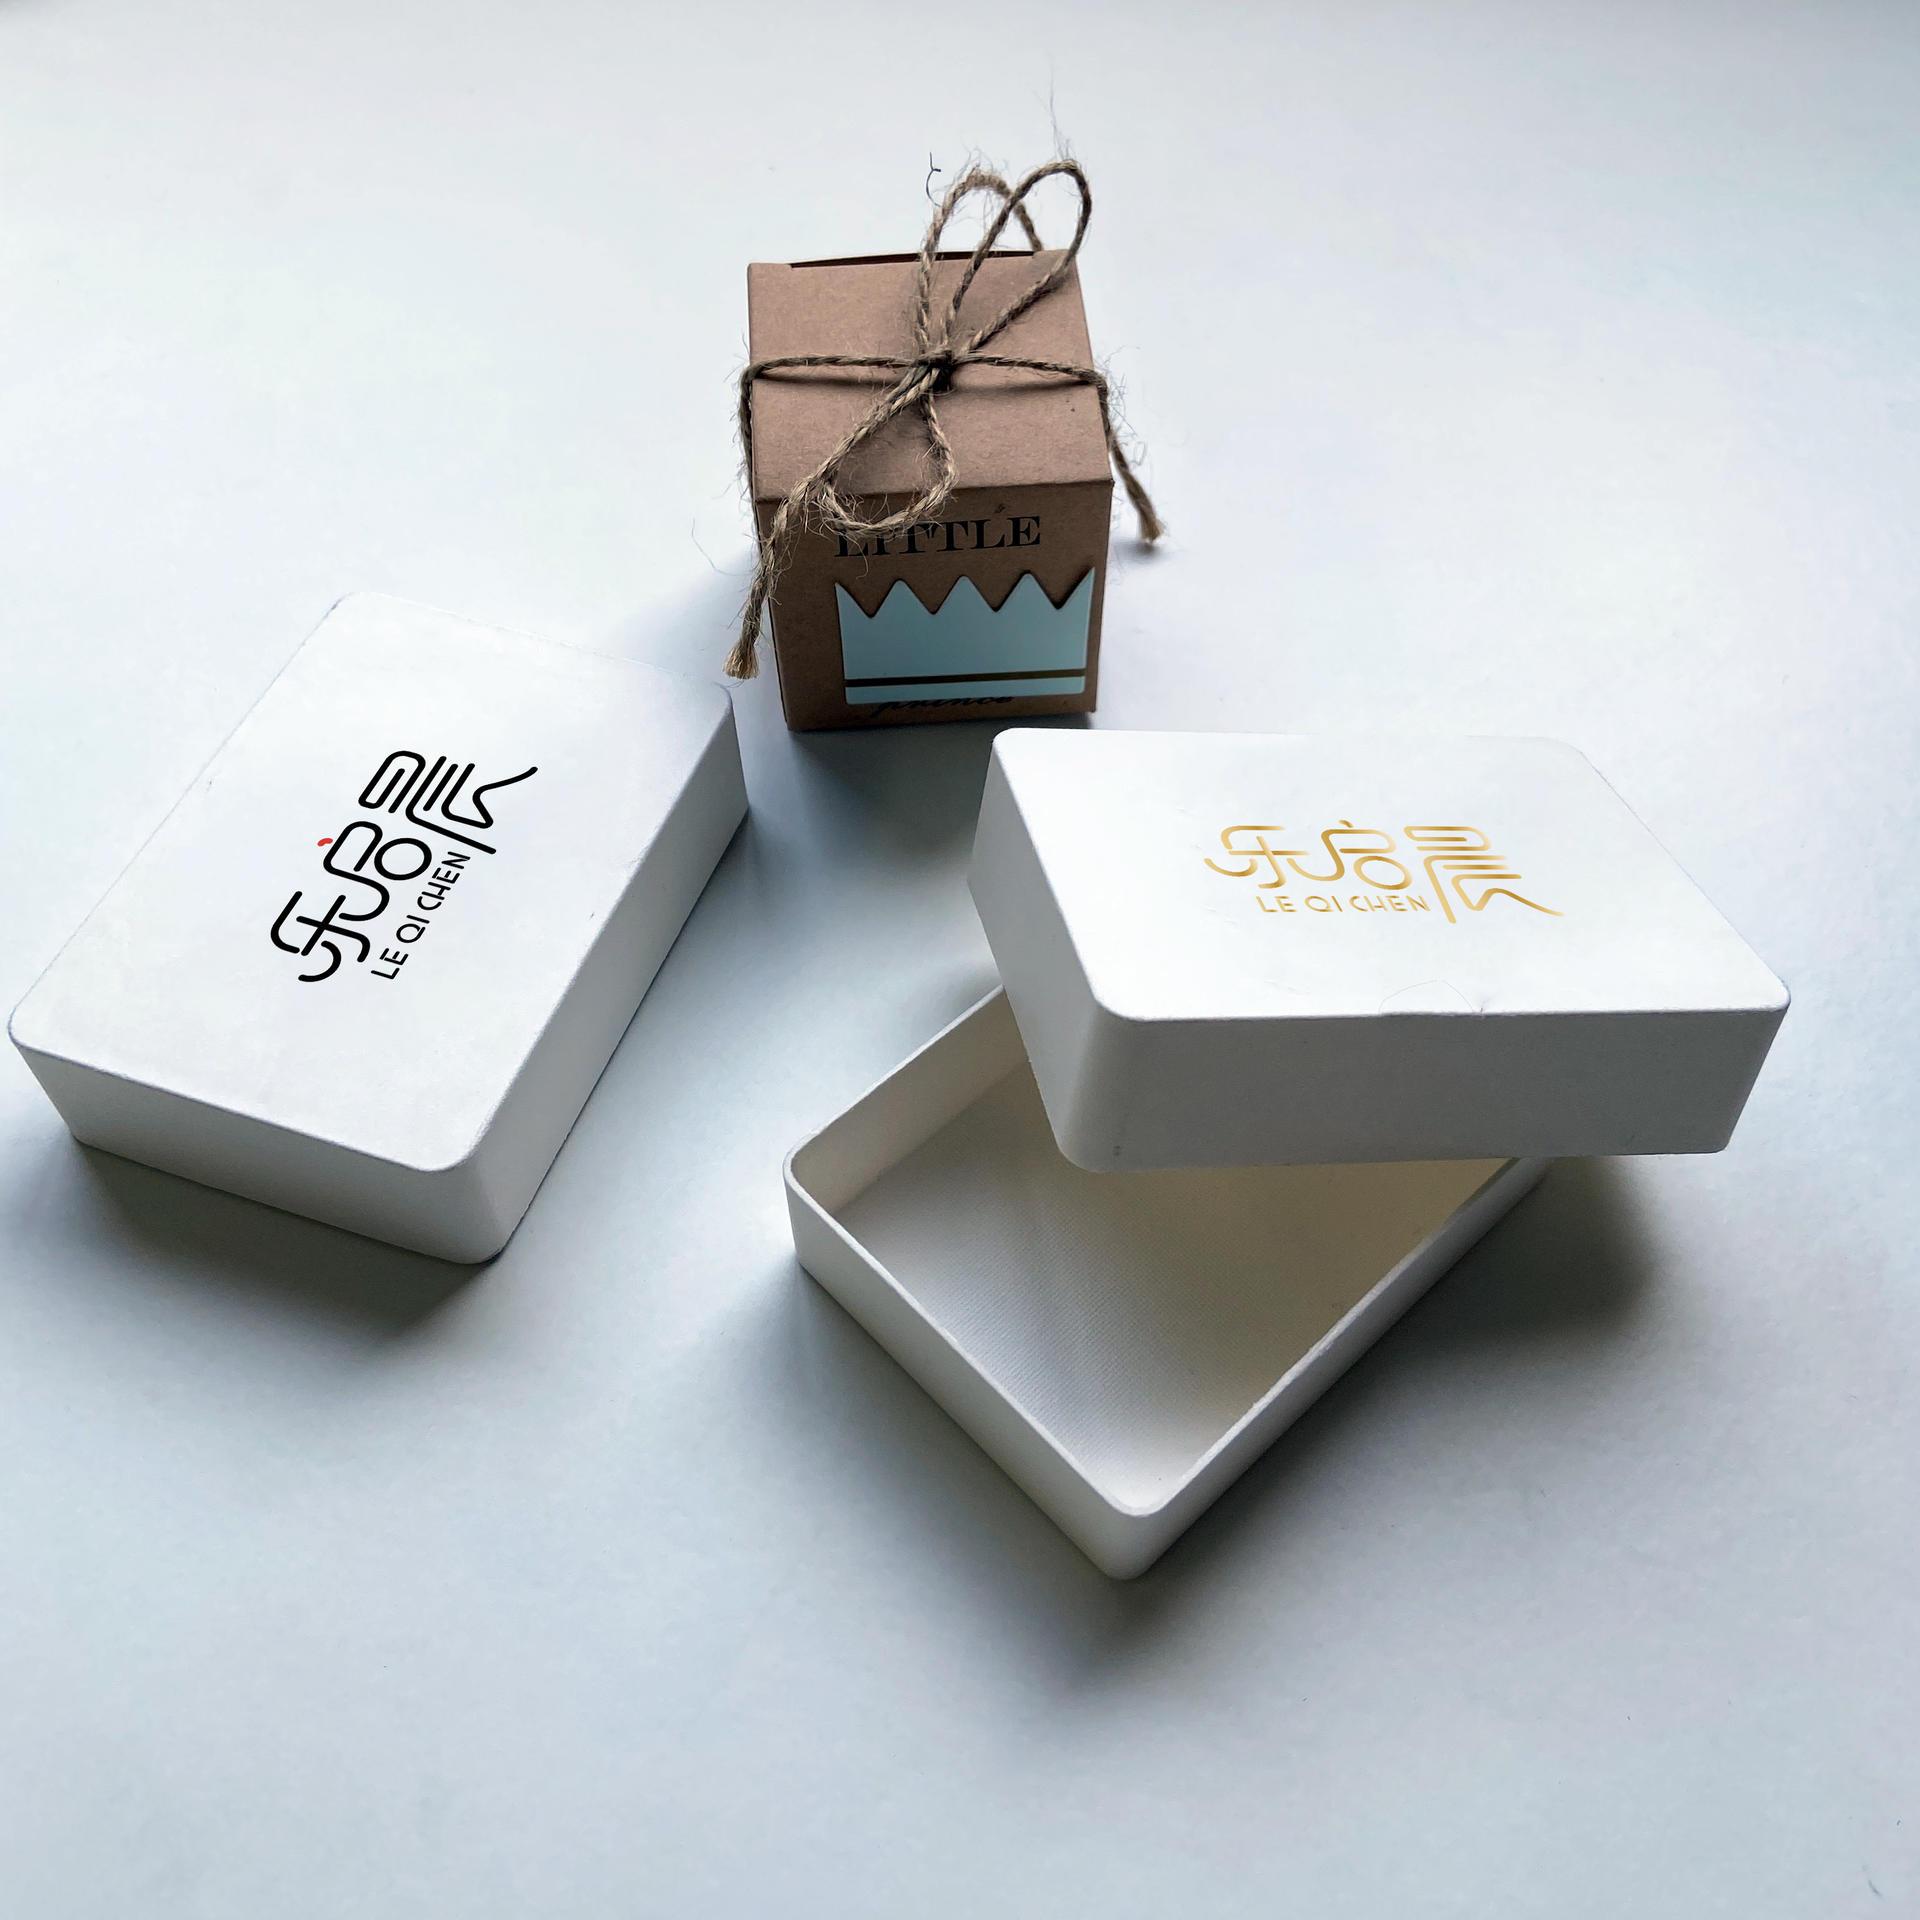 Guangzhou Manufacturer Custom Printing pamdora jewelry box,paper box with custom logo